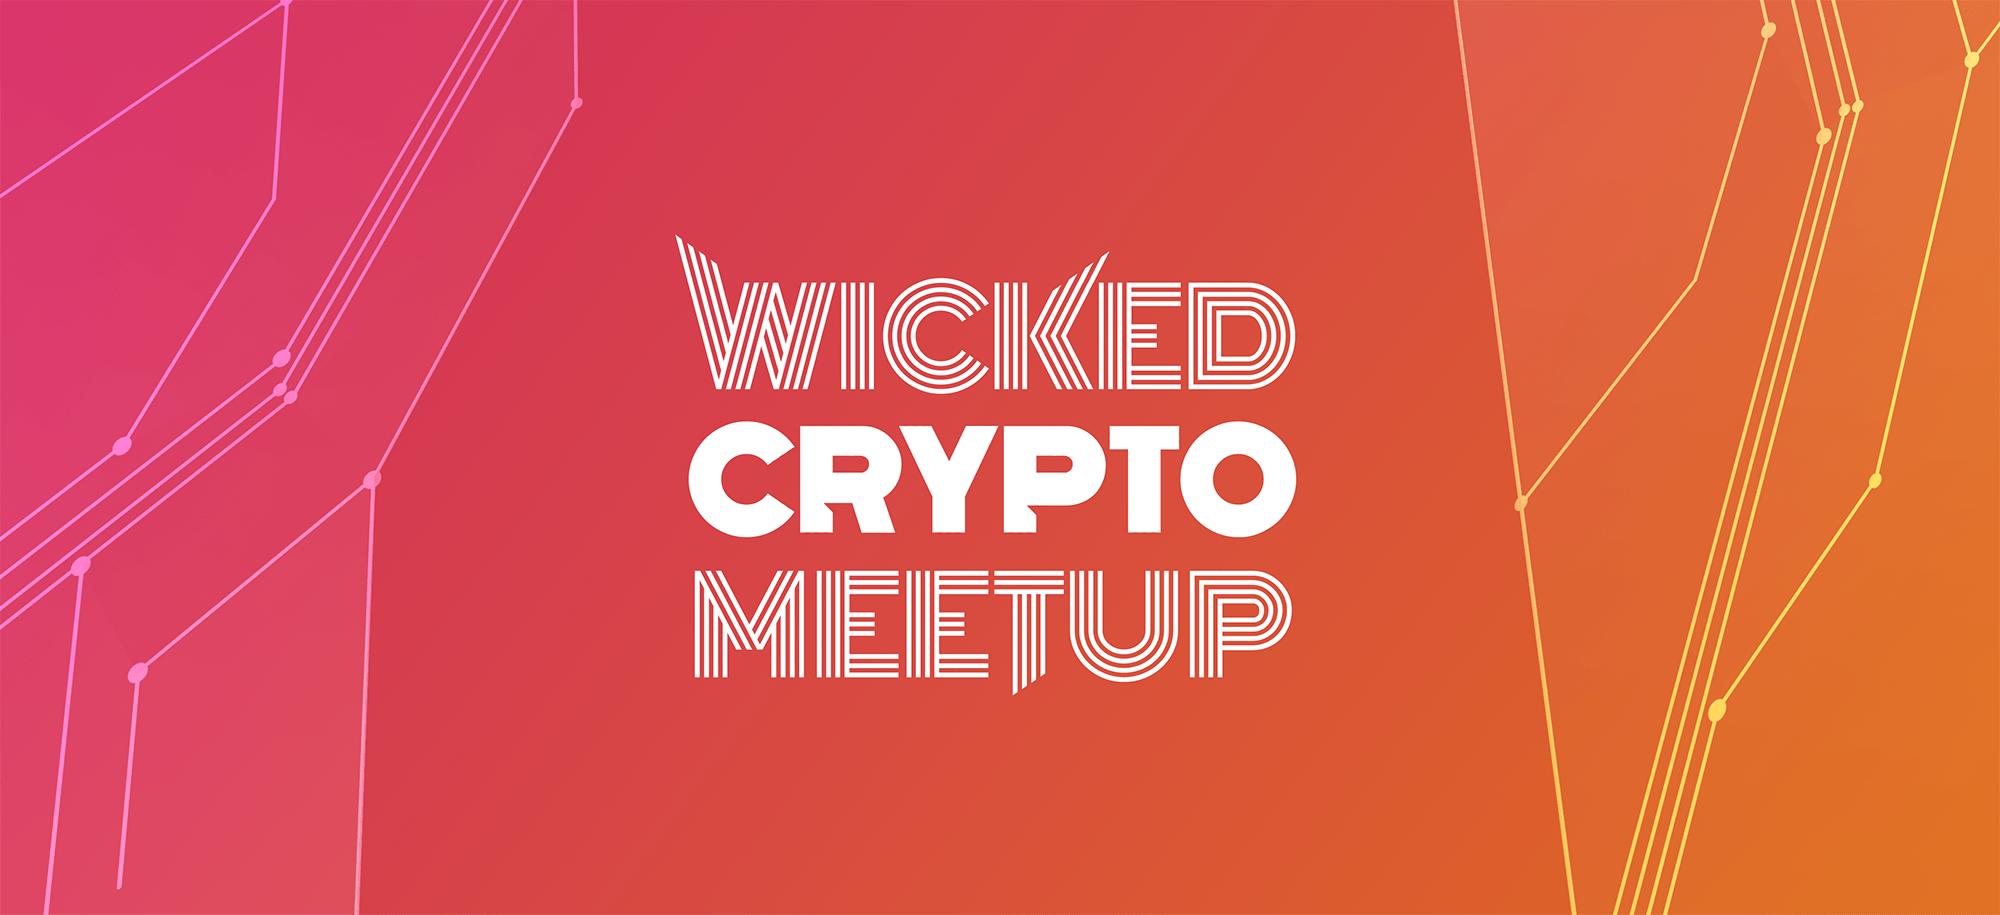 02.10.2018 – Wicked Crypto Meetup #9